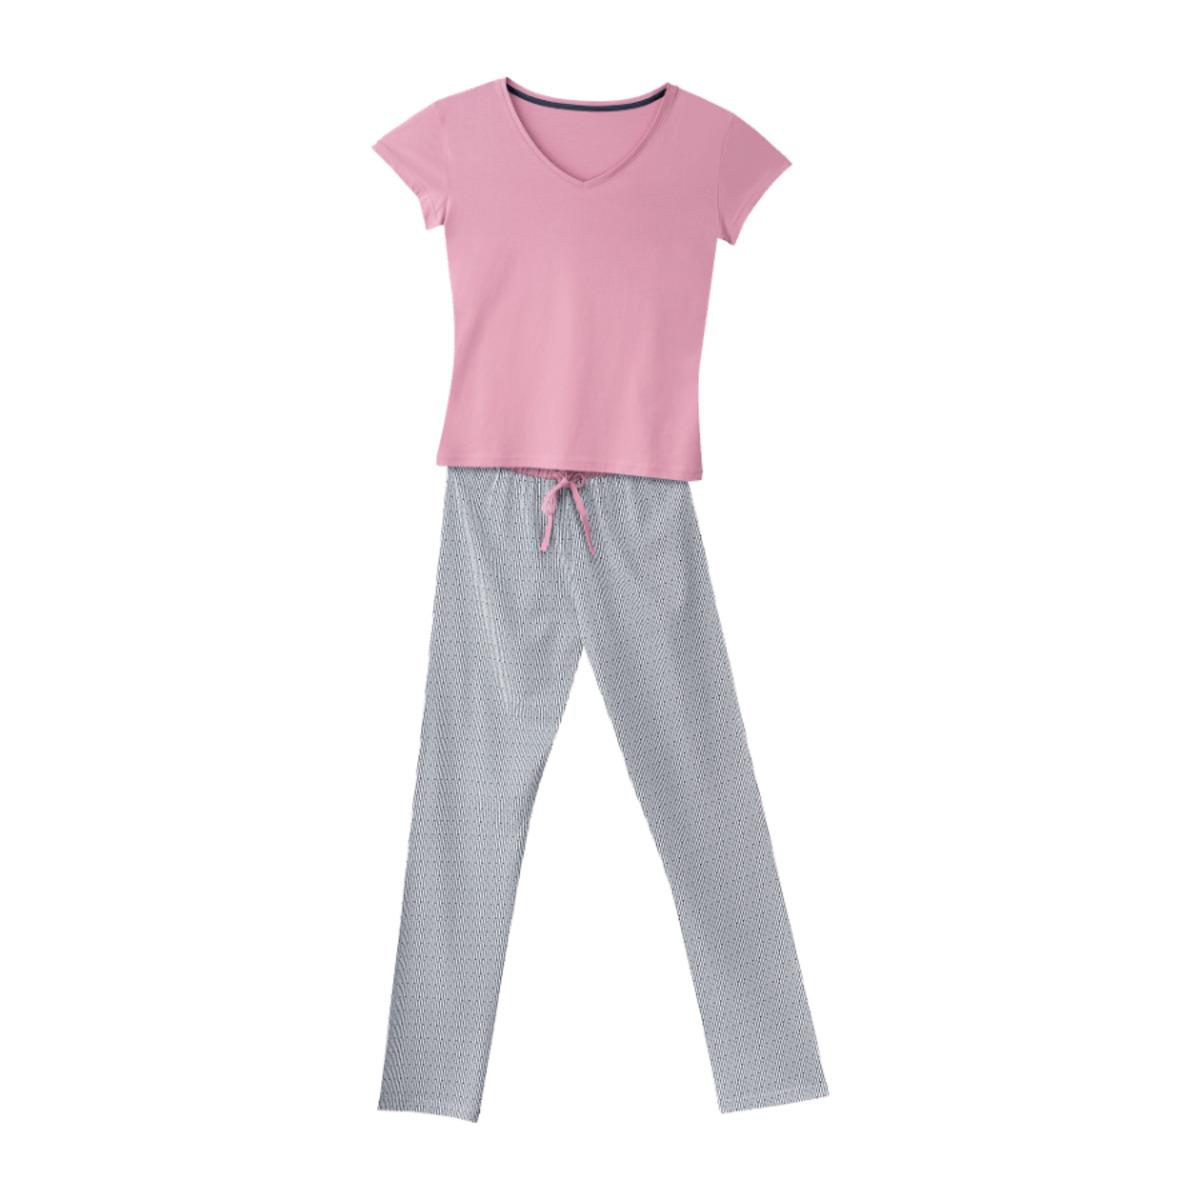 Bild 4 von QUEENTEX     Pyjama